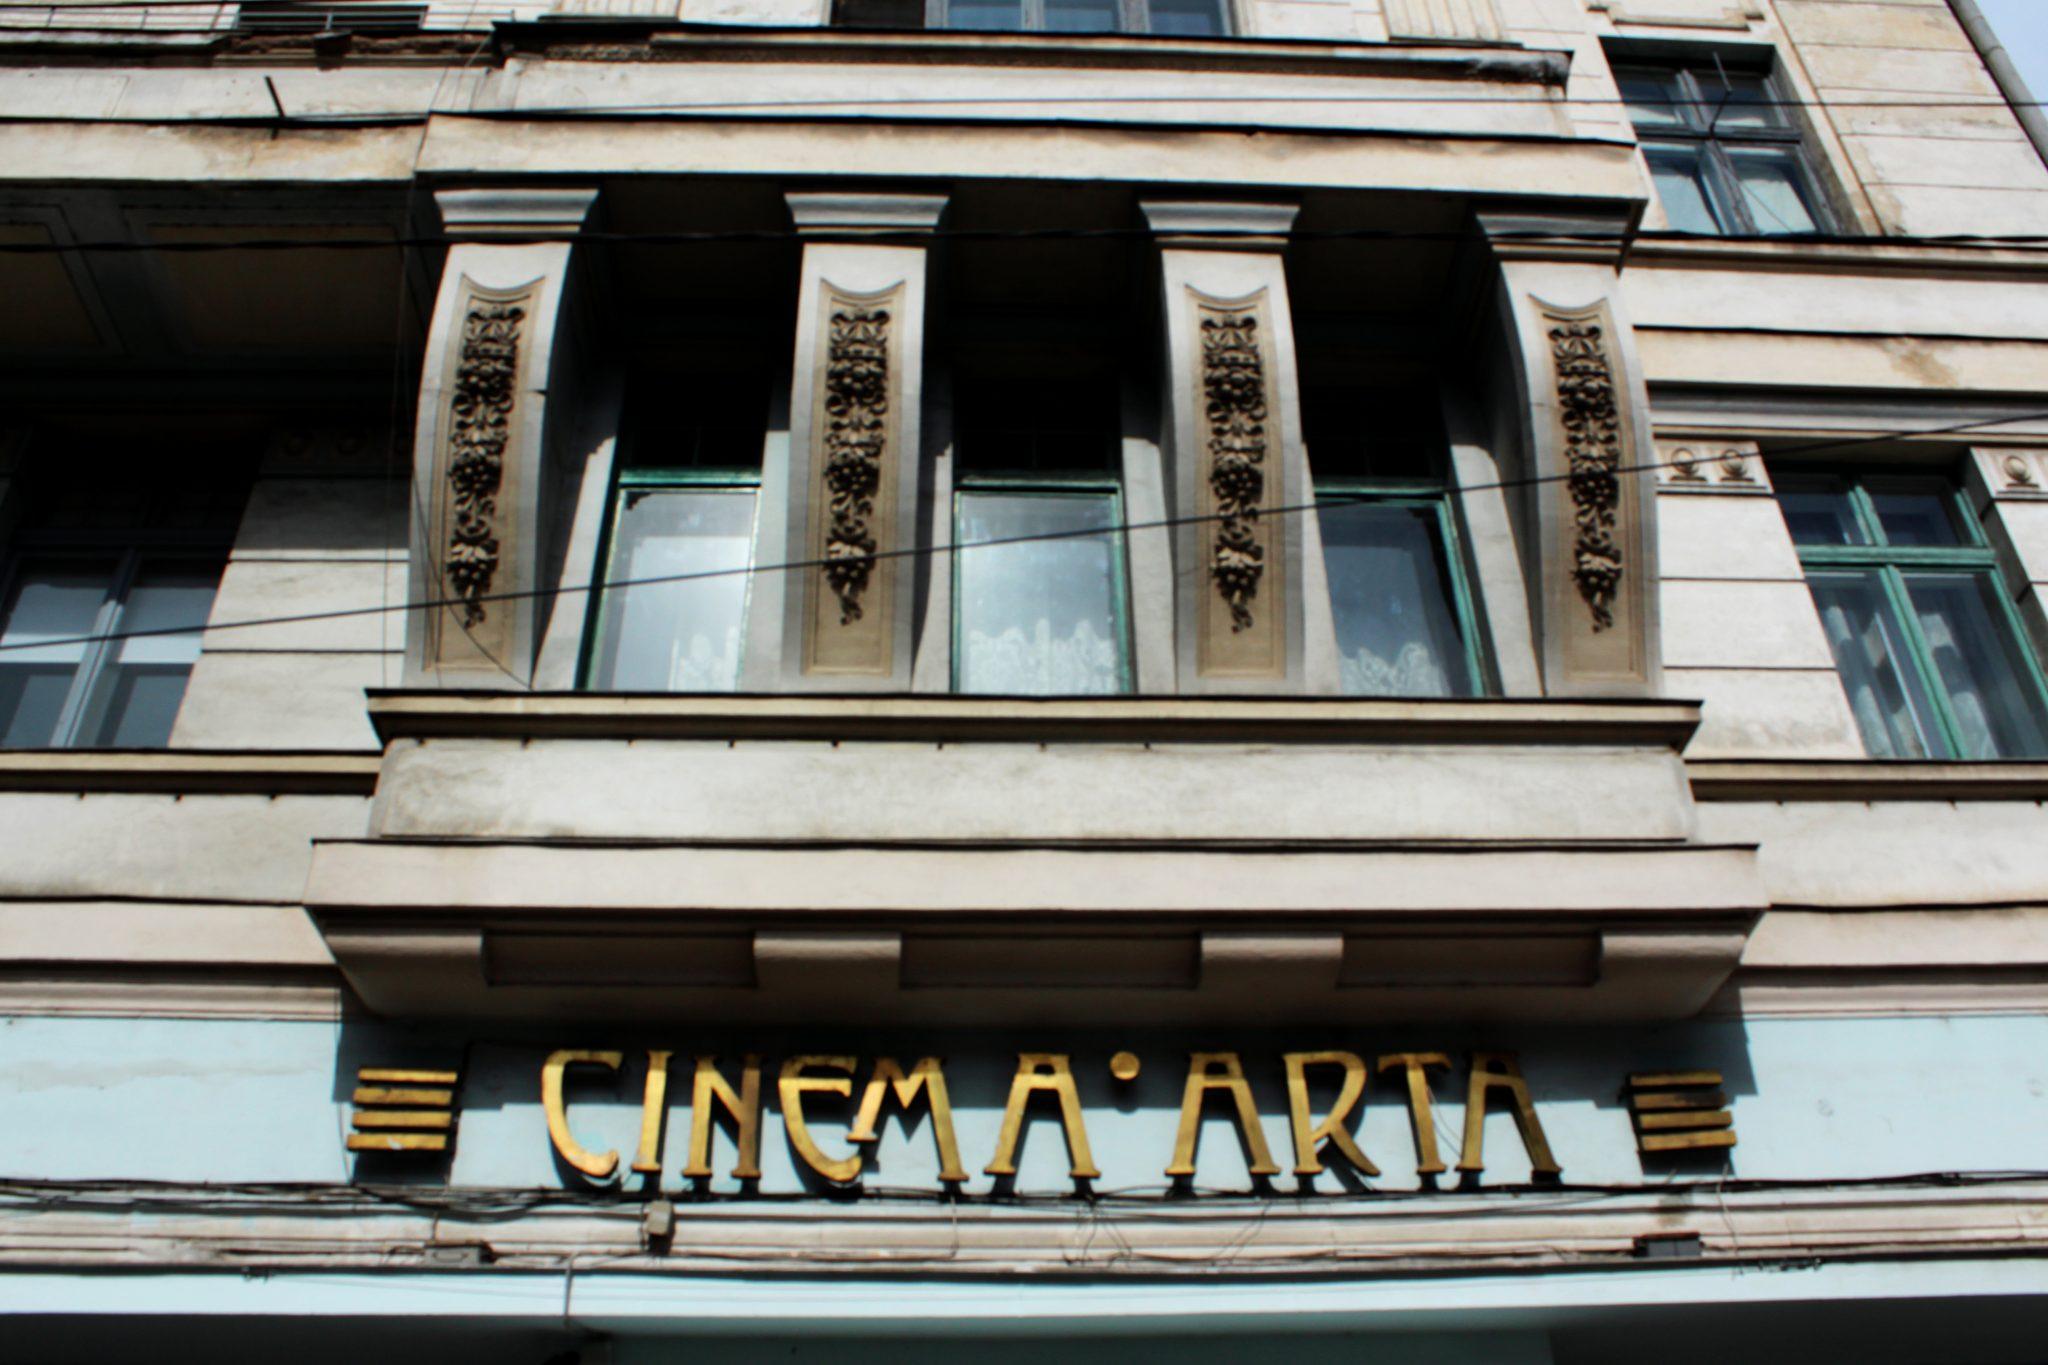 Cinema Arta Cluj. Fotografie din arhiva personală